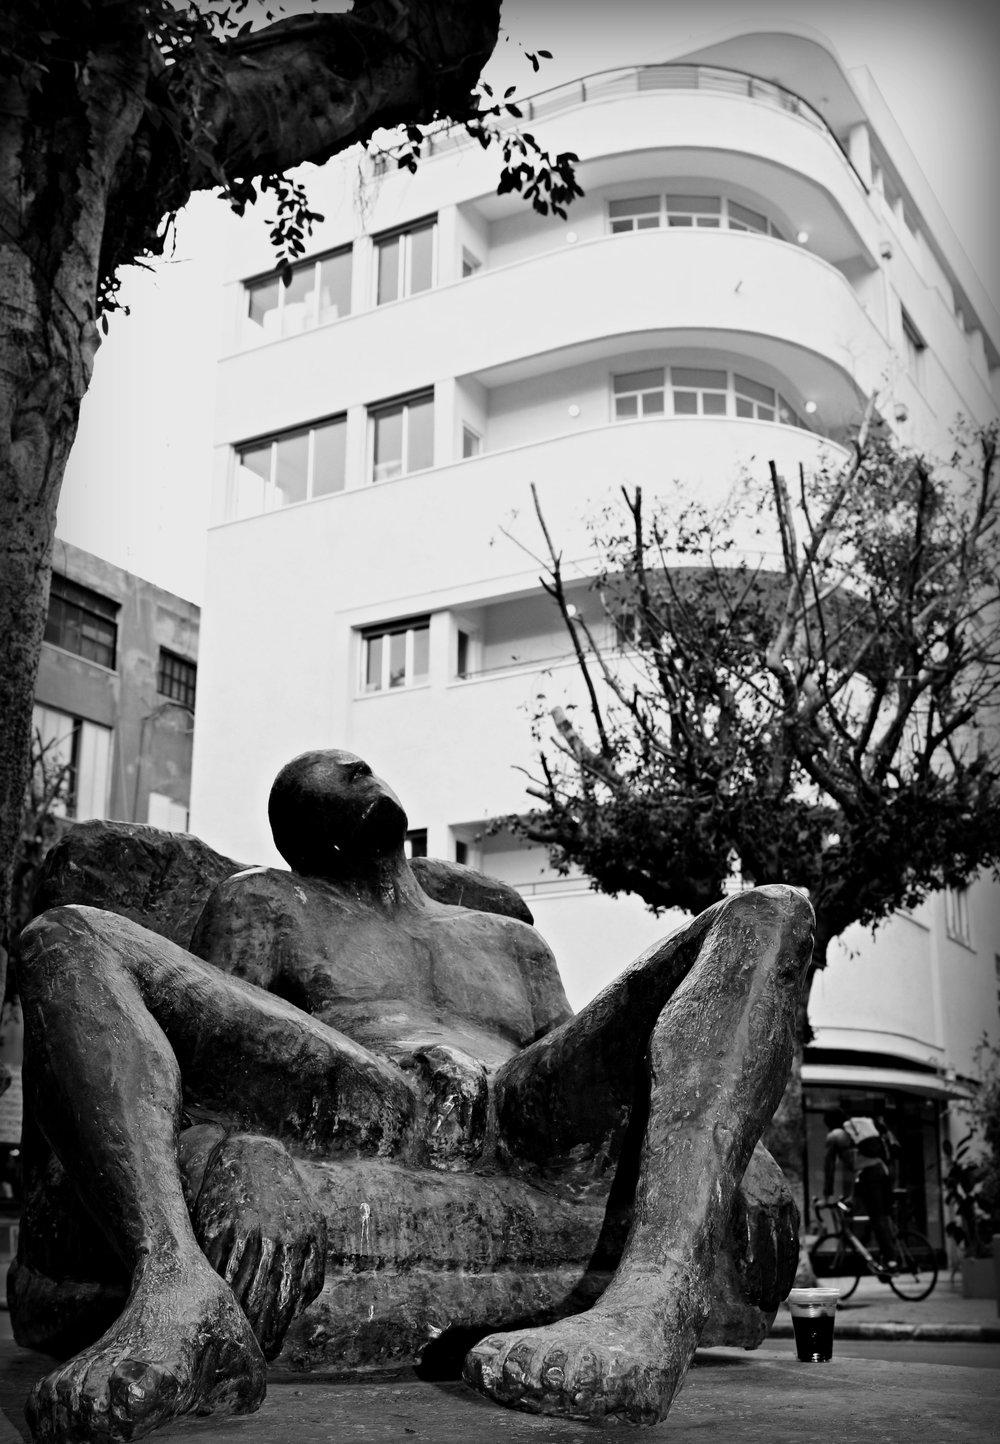 A Male Statue & Bauhaus Style Building